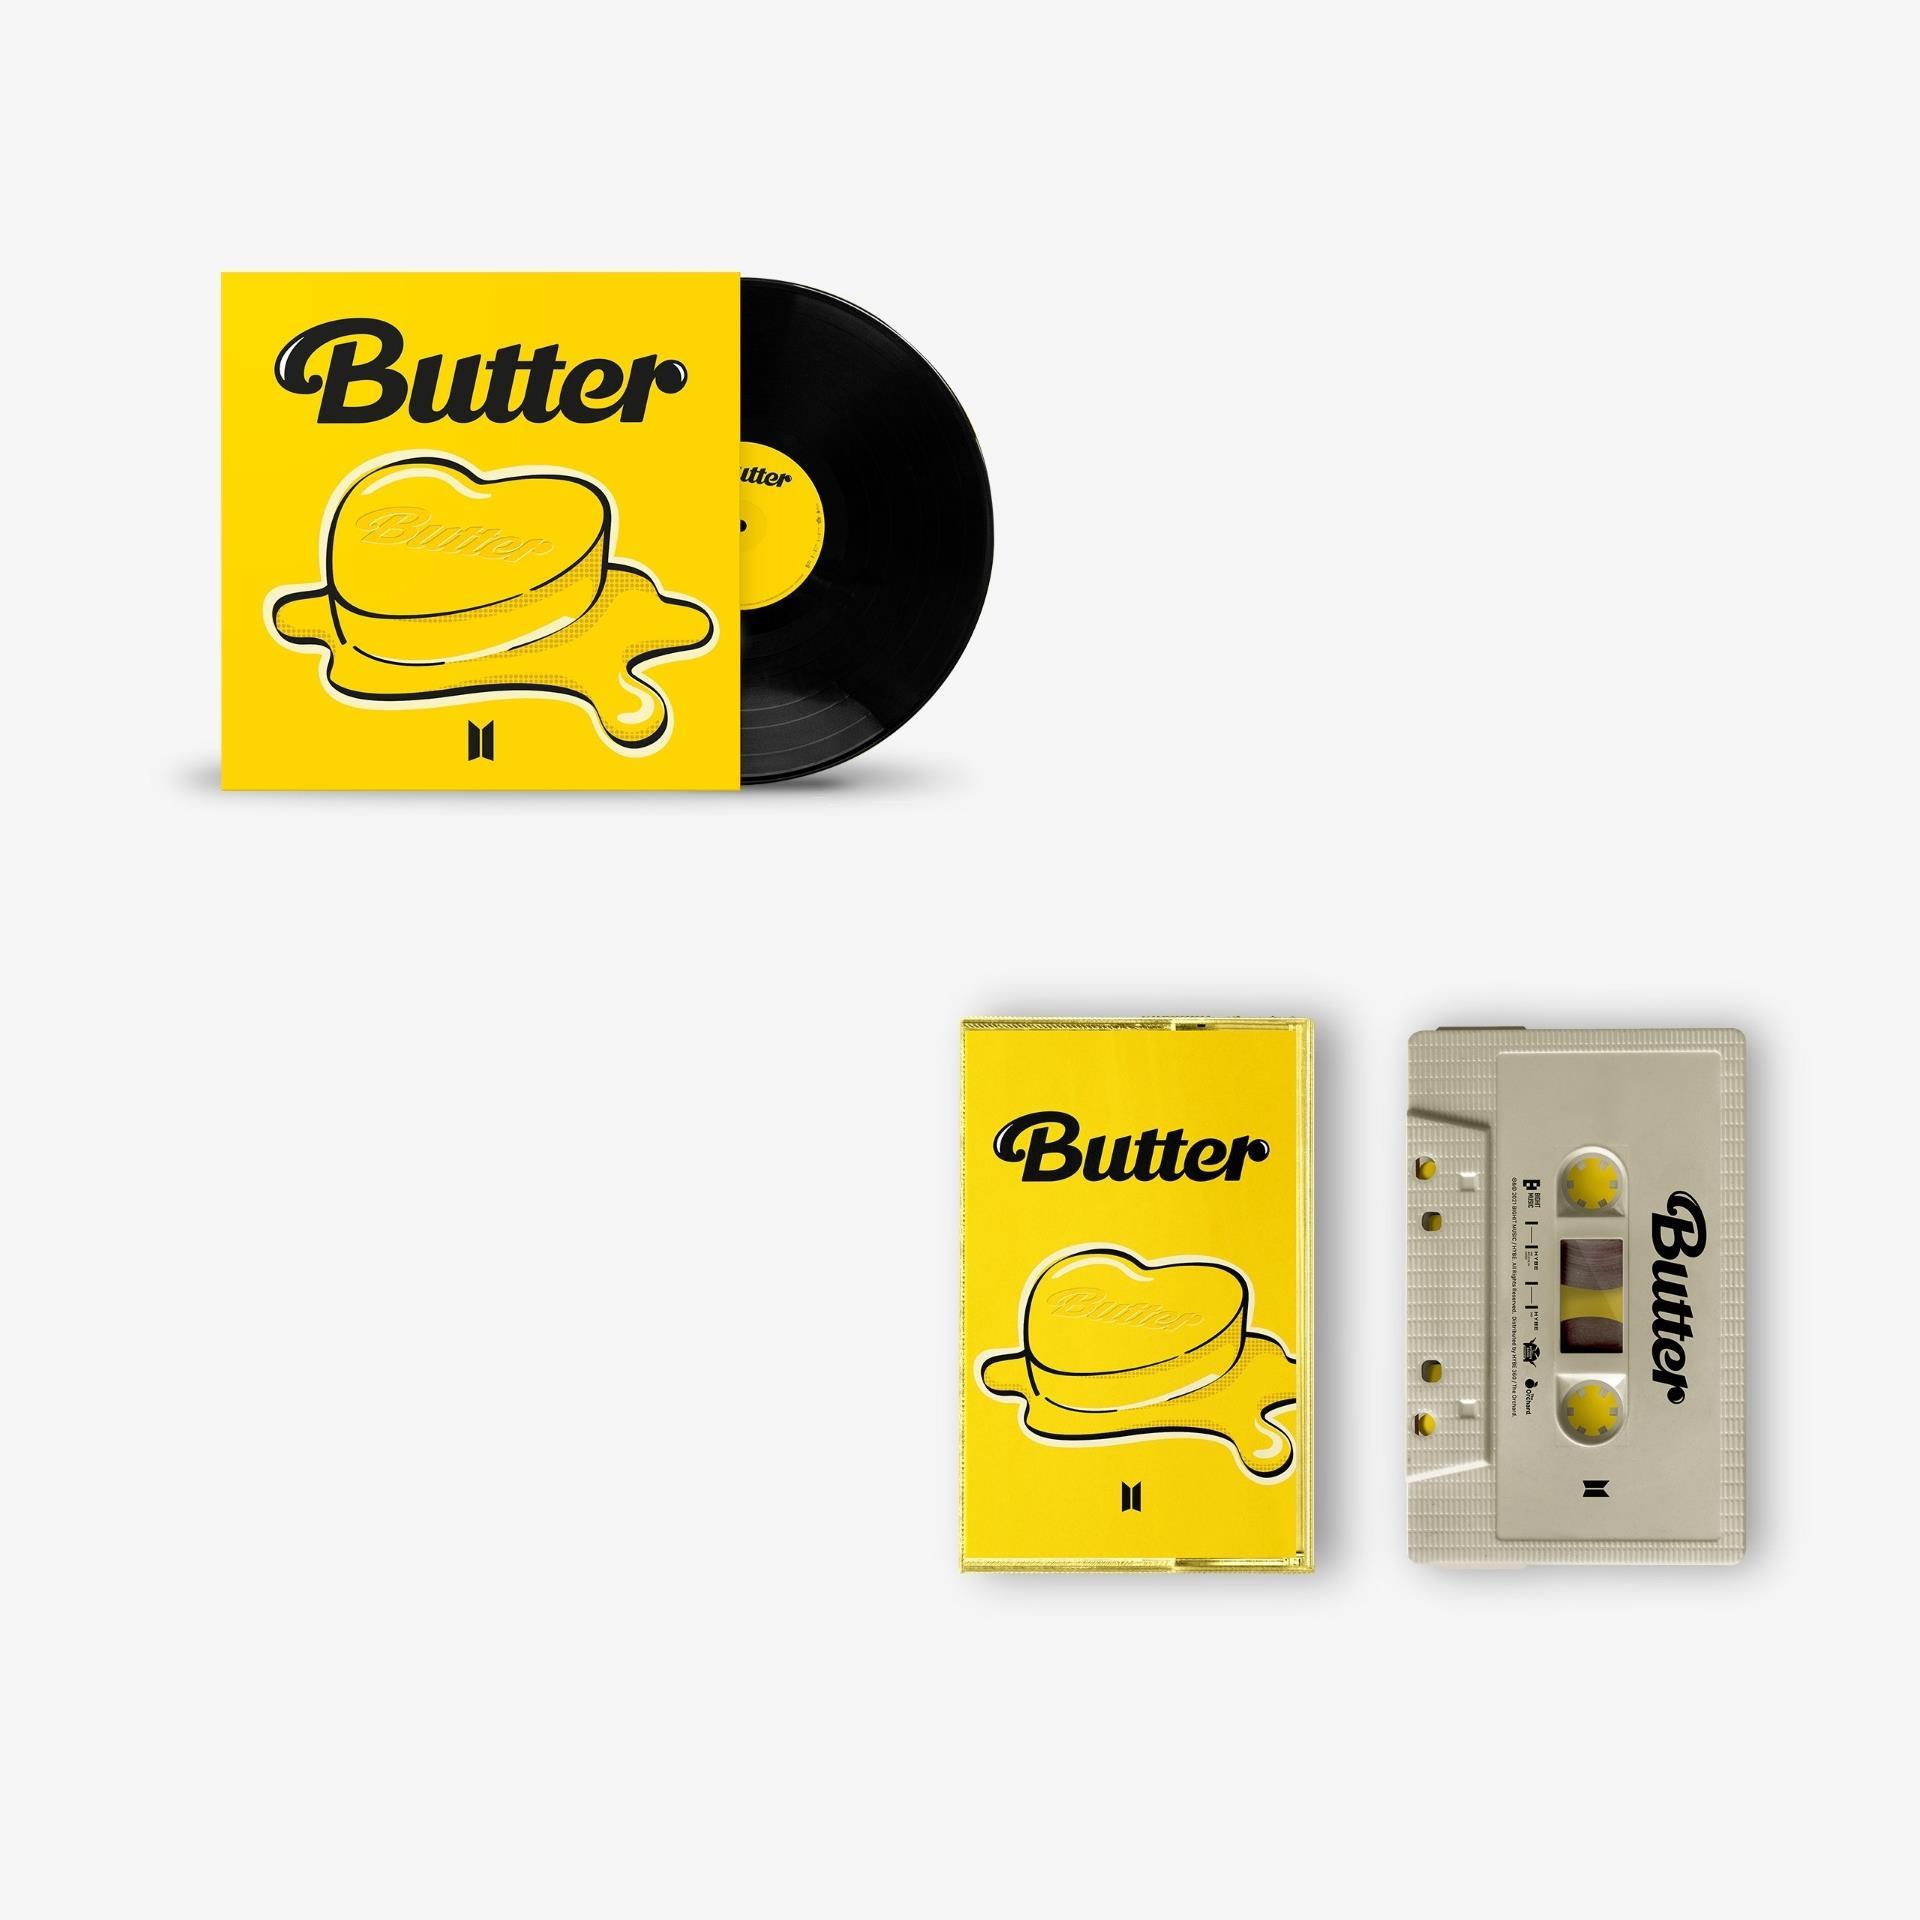 BTS Butter Vinyl and Cassette set